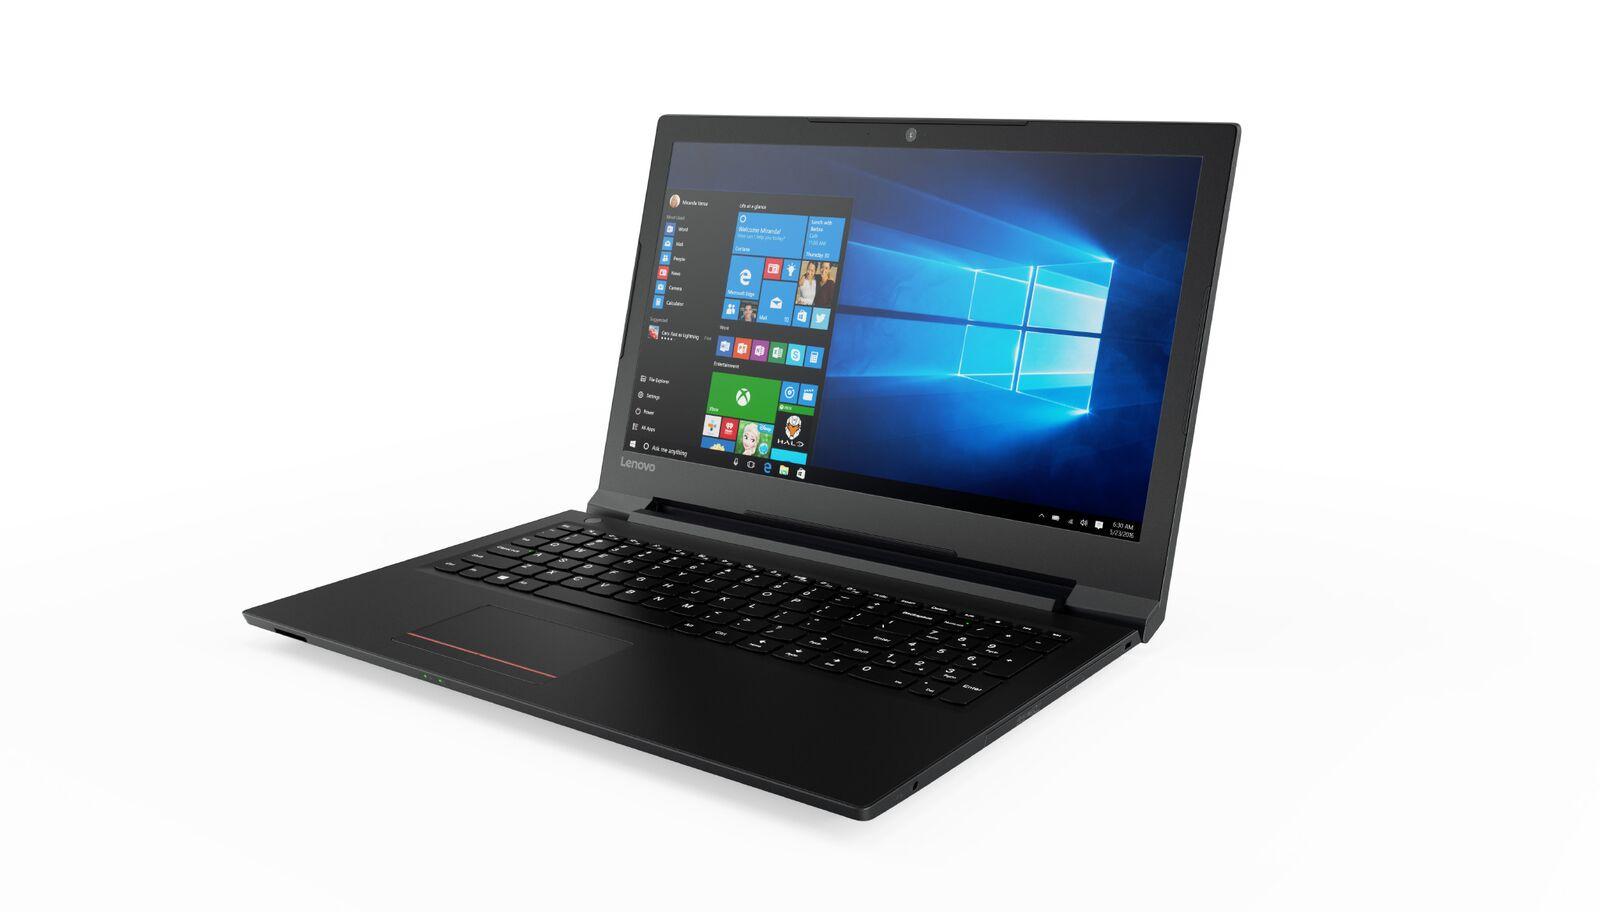 "IBM LENOVO - Lenovo V110 15.6""HD/N4200/4G/1TB/INT/DVD/W10"